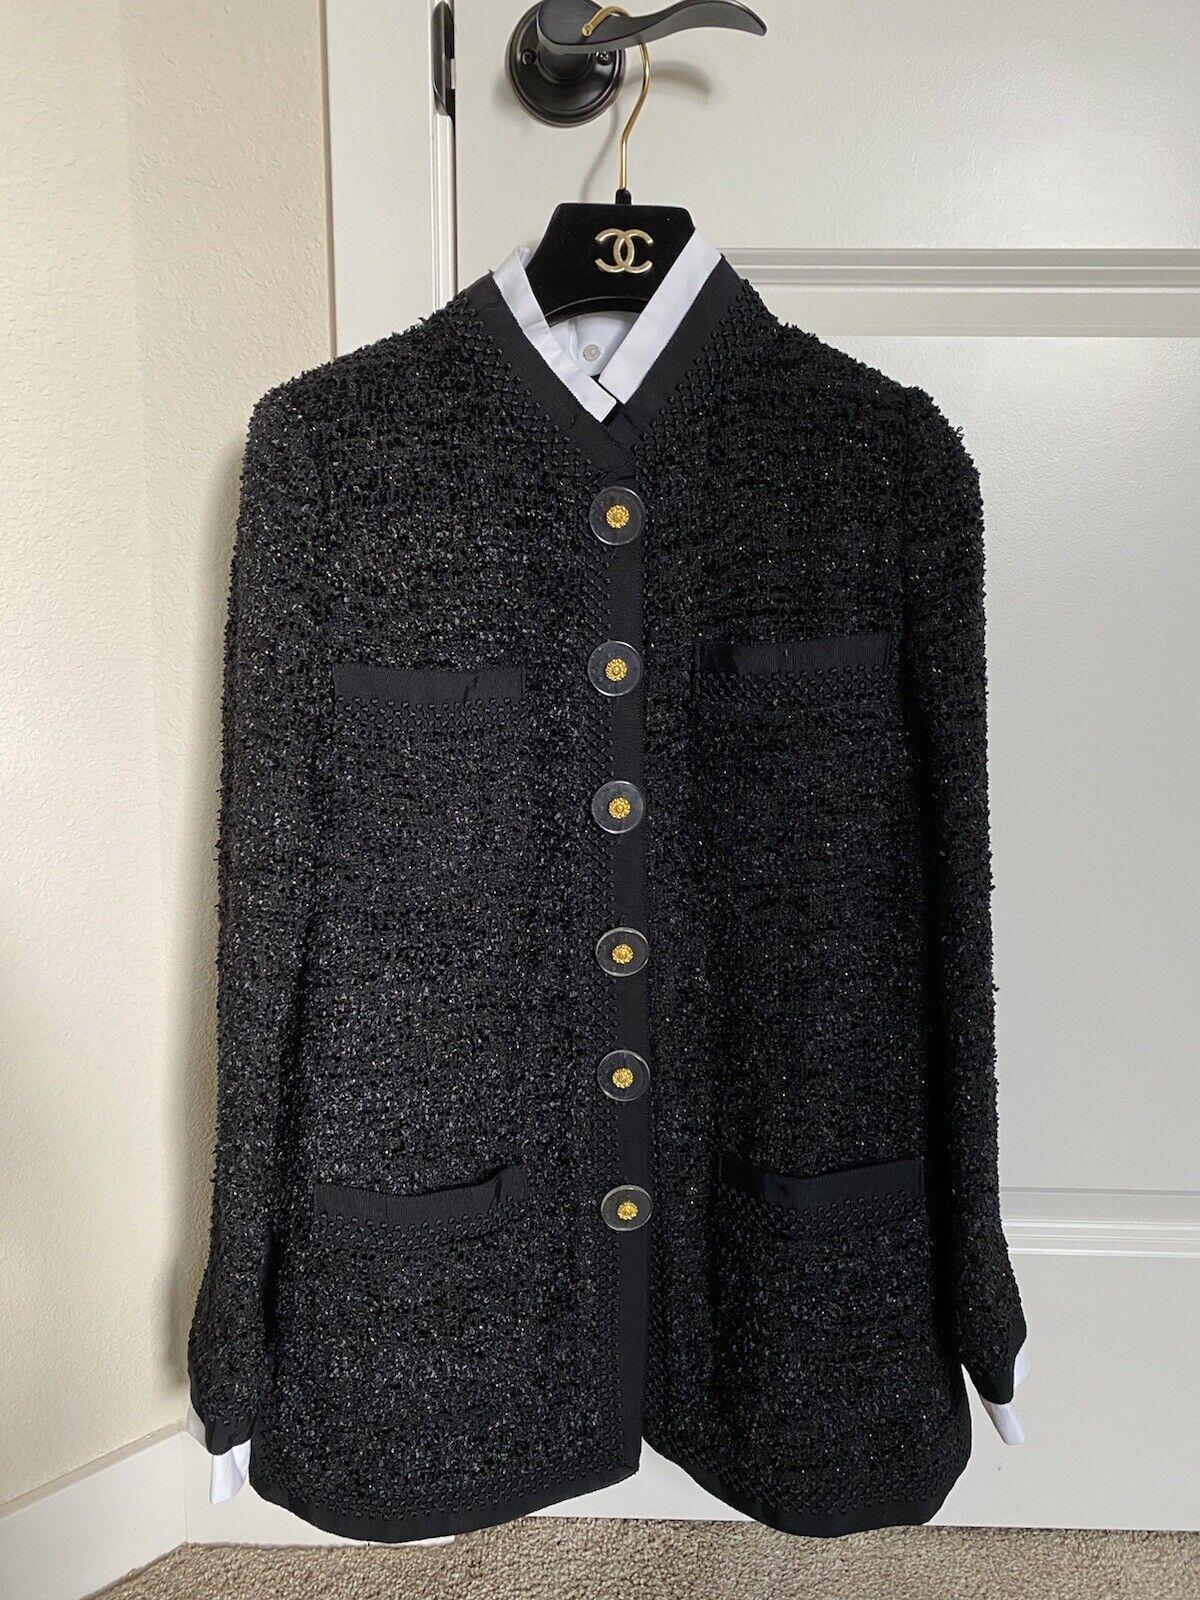 Authentic Chanel Tweed Jacket 2019 Cosmopolite - image 1